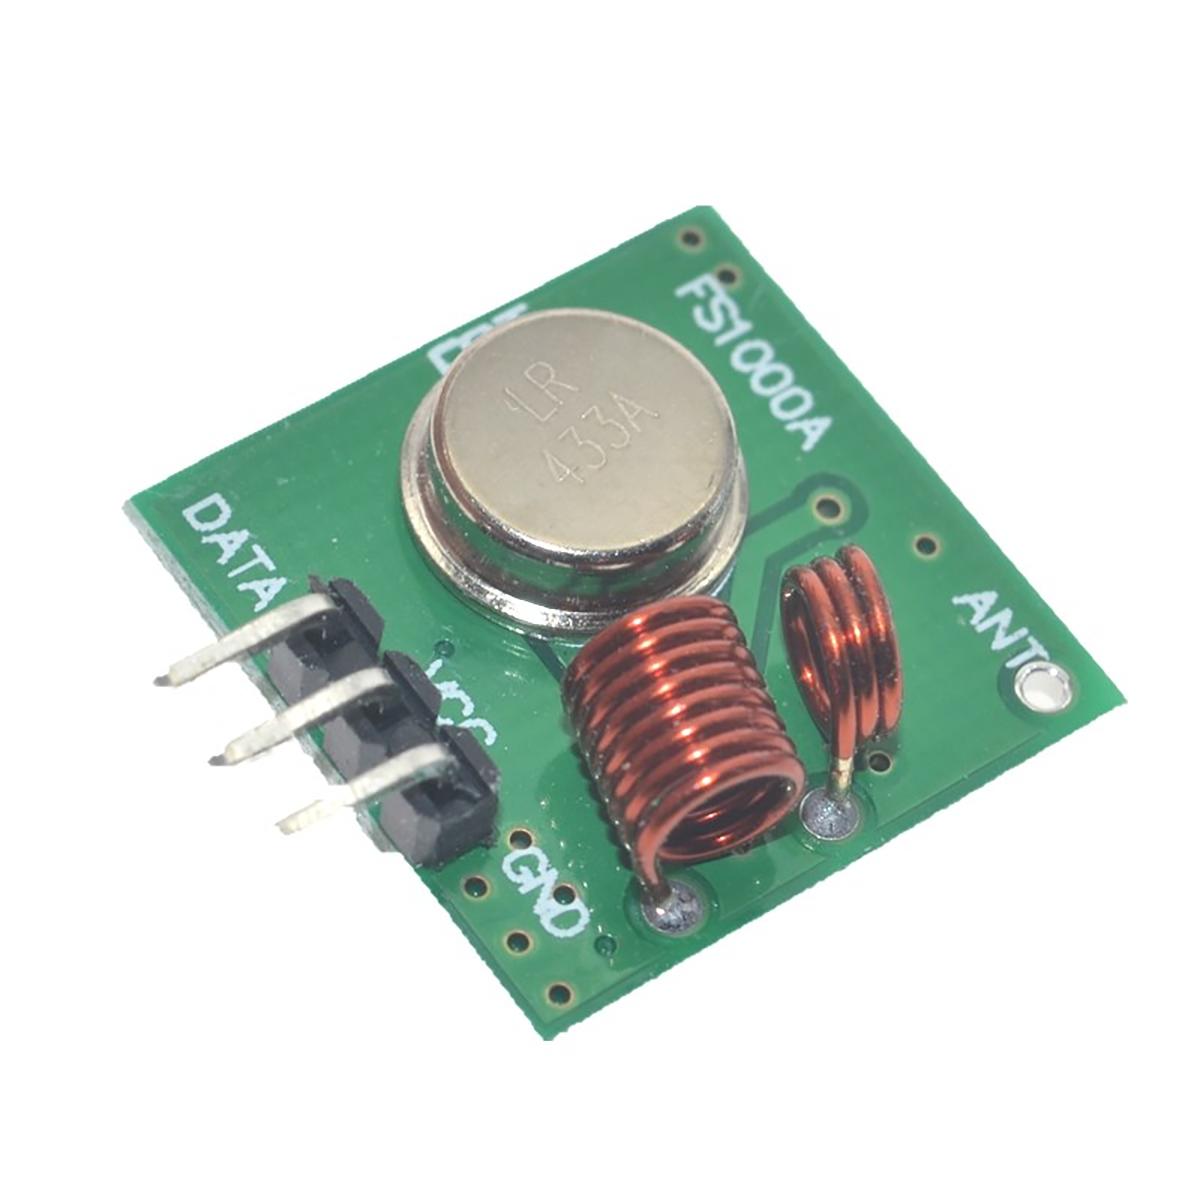 Módulo Rf Transmisor Y Receptor 433 Mhz Radiofrecuencia